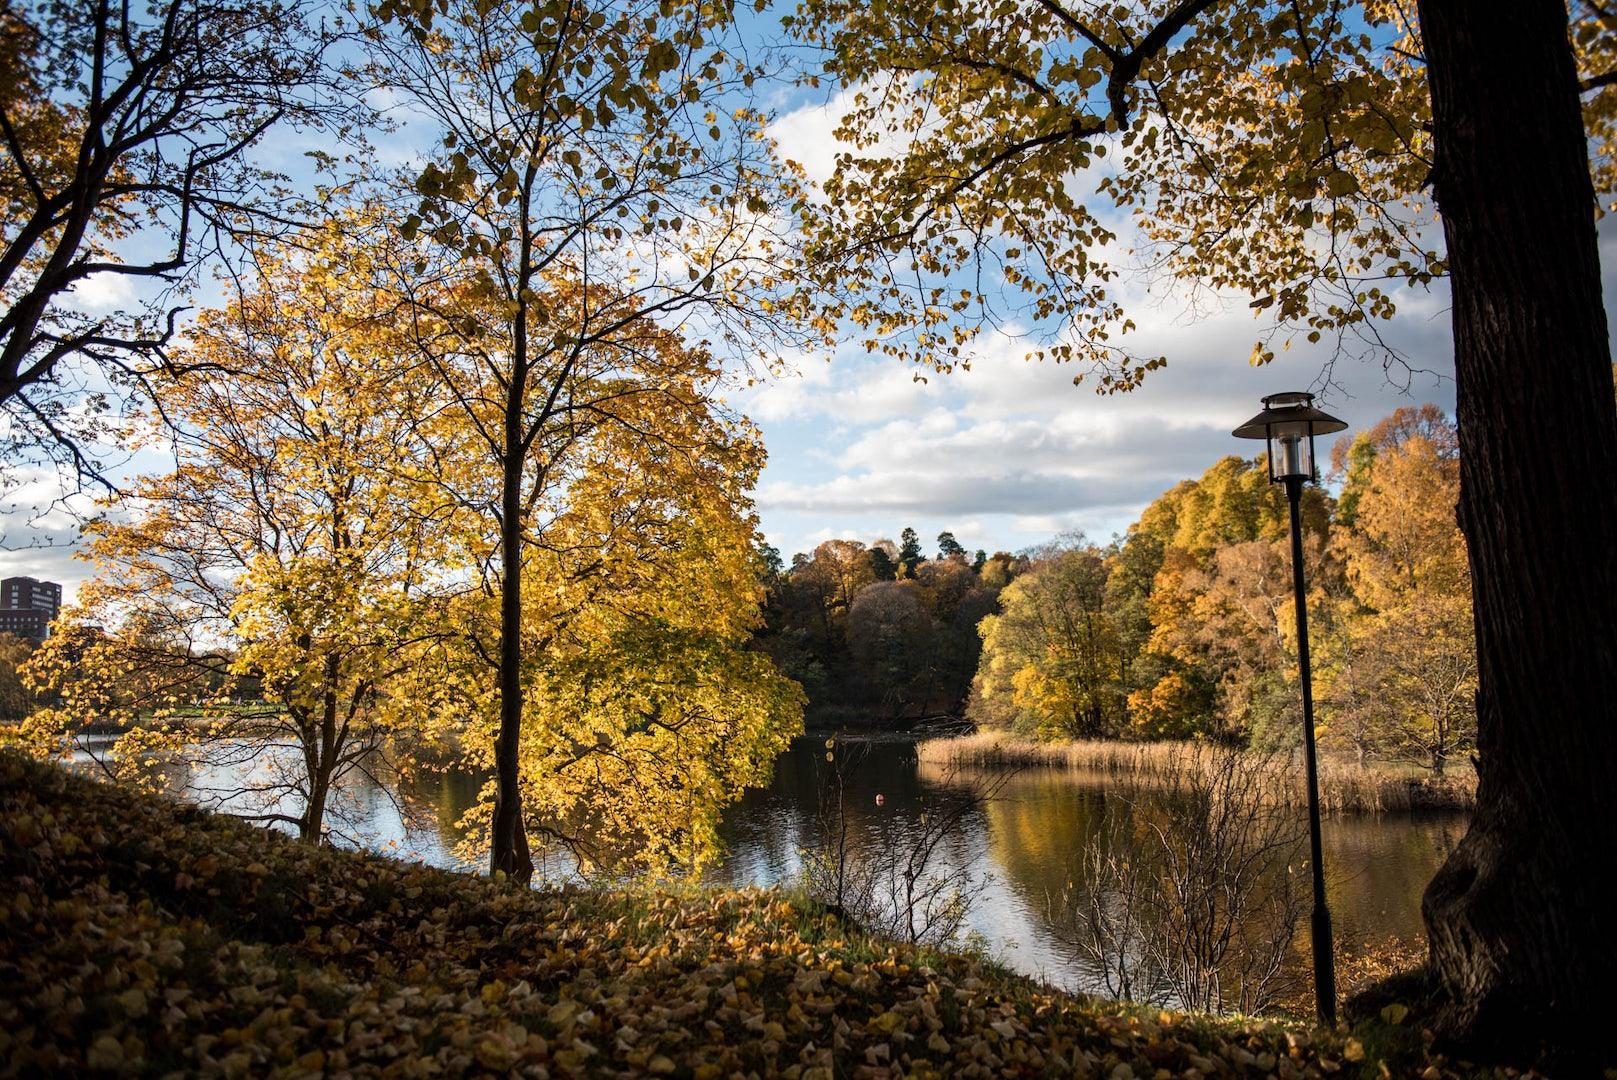 trees during autumn in Bellevueparken Stockholm